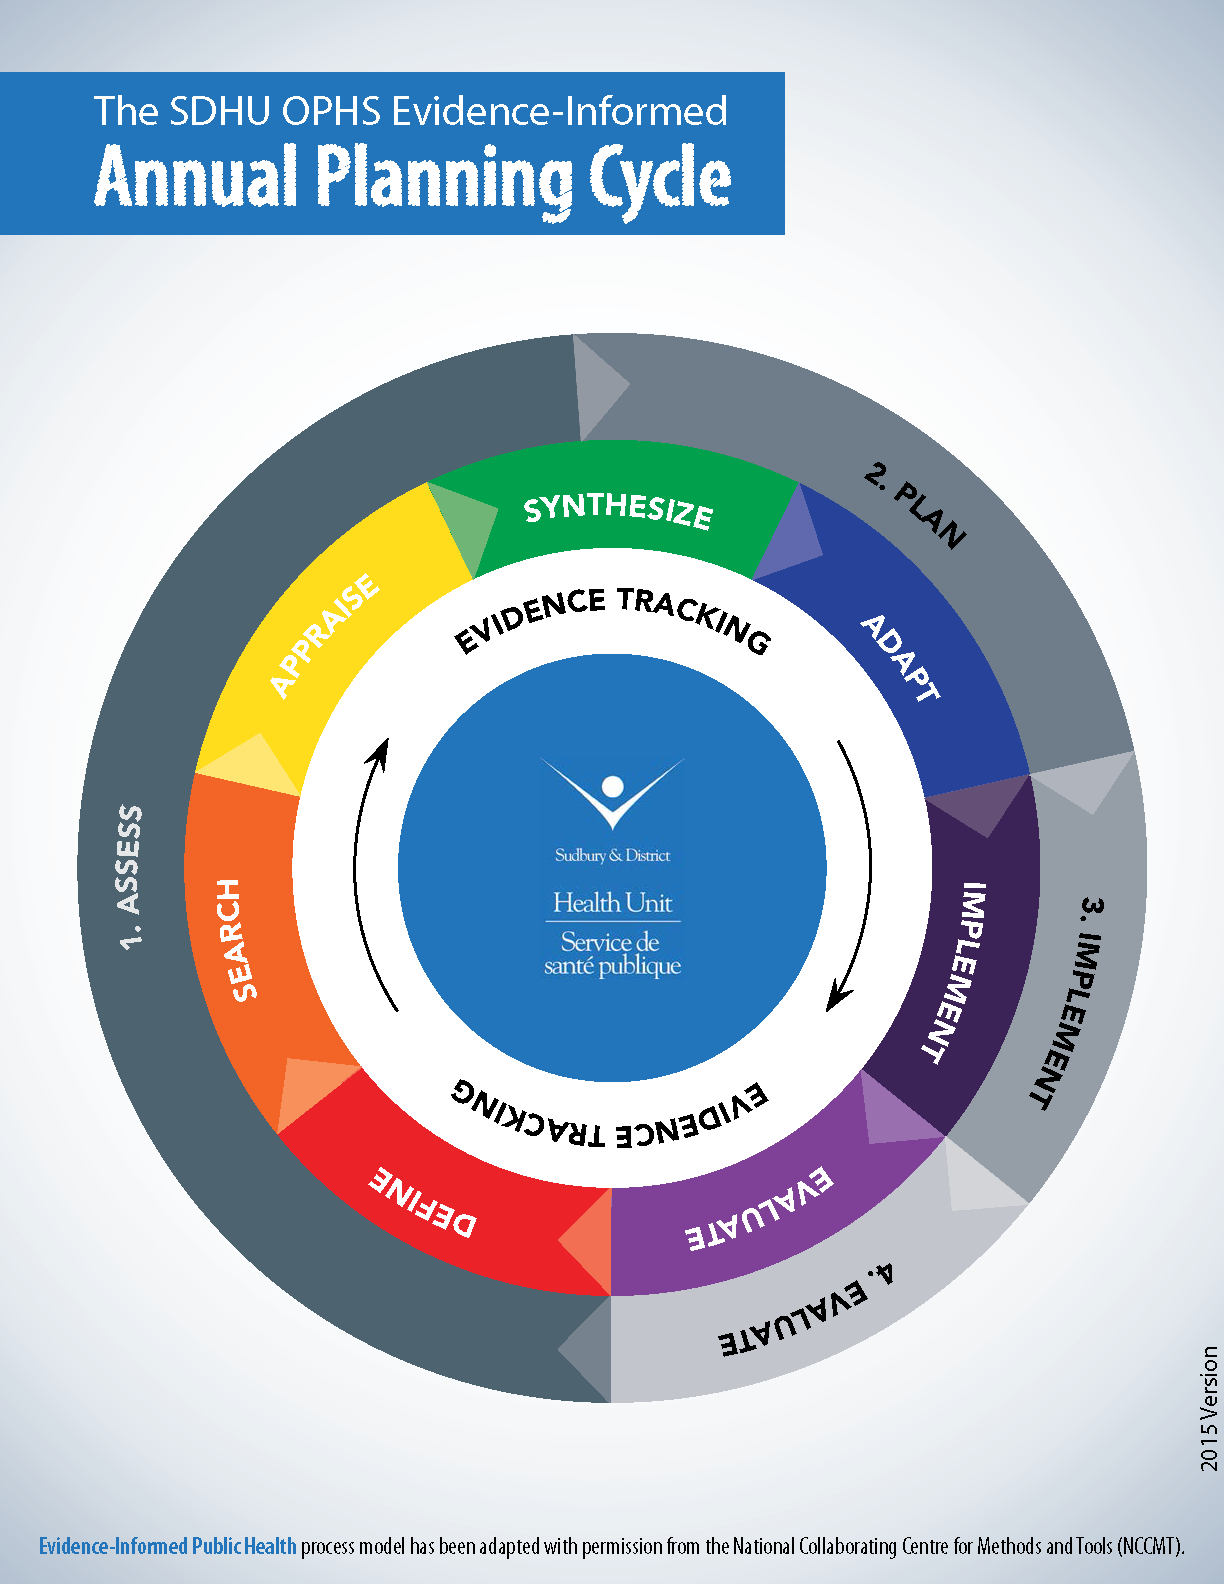 SDHU Planning Cycle